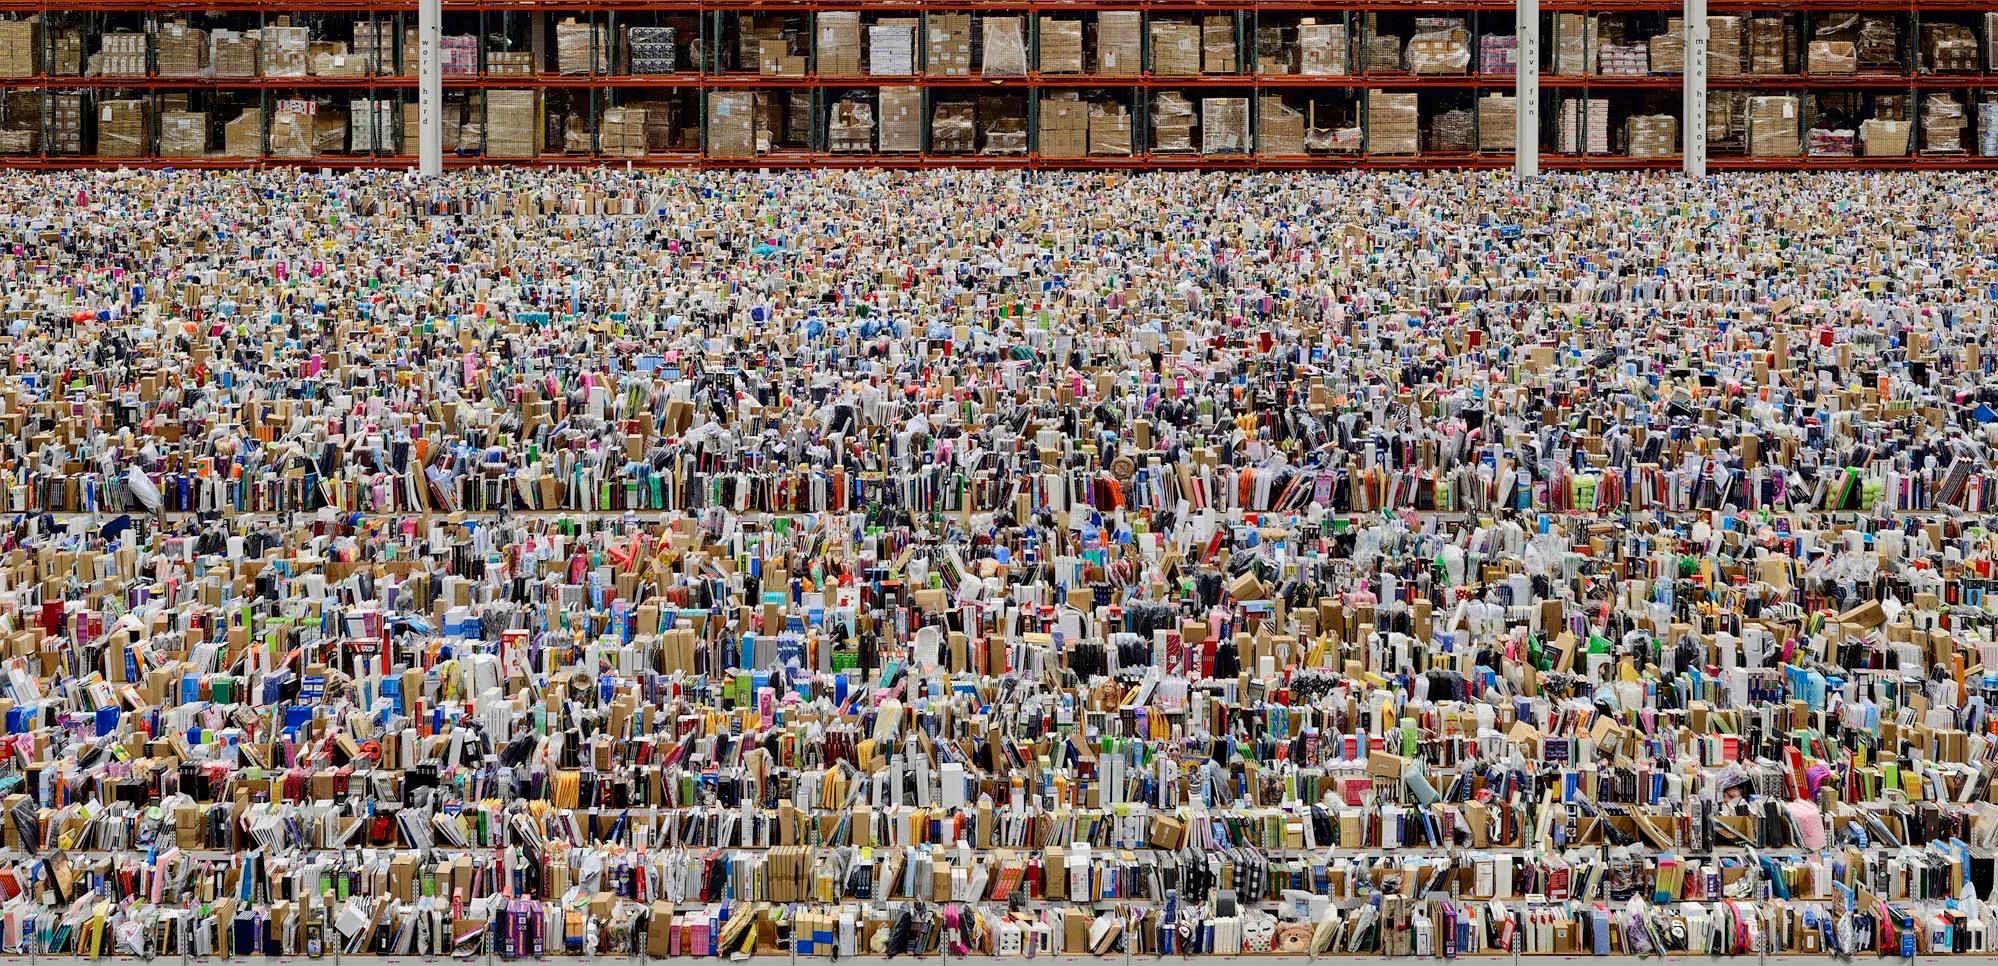 ANDREAS GURSKY   Ohne Titel XVIII/Untitled XVIII , 2015  Inkjet print  Framed  120 7/8 × 87 3/16 × 2 7/16 inches   © Andreas Gursky / 2016 Artists Rights Society (ARS), New York / VG Bild-Kunst, Bonn. Courtesy Gagosian.